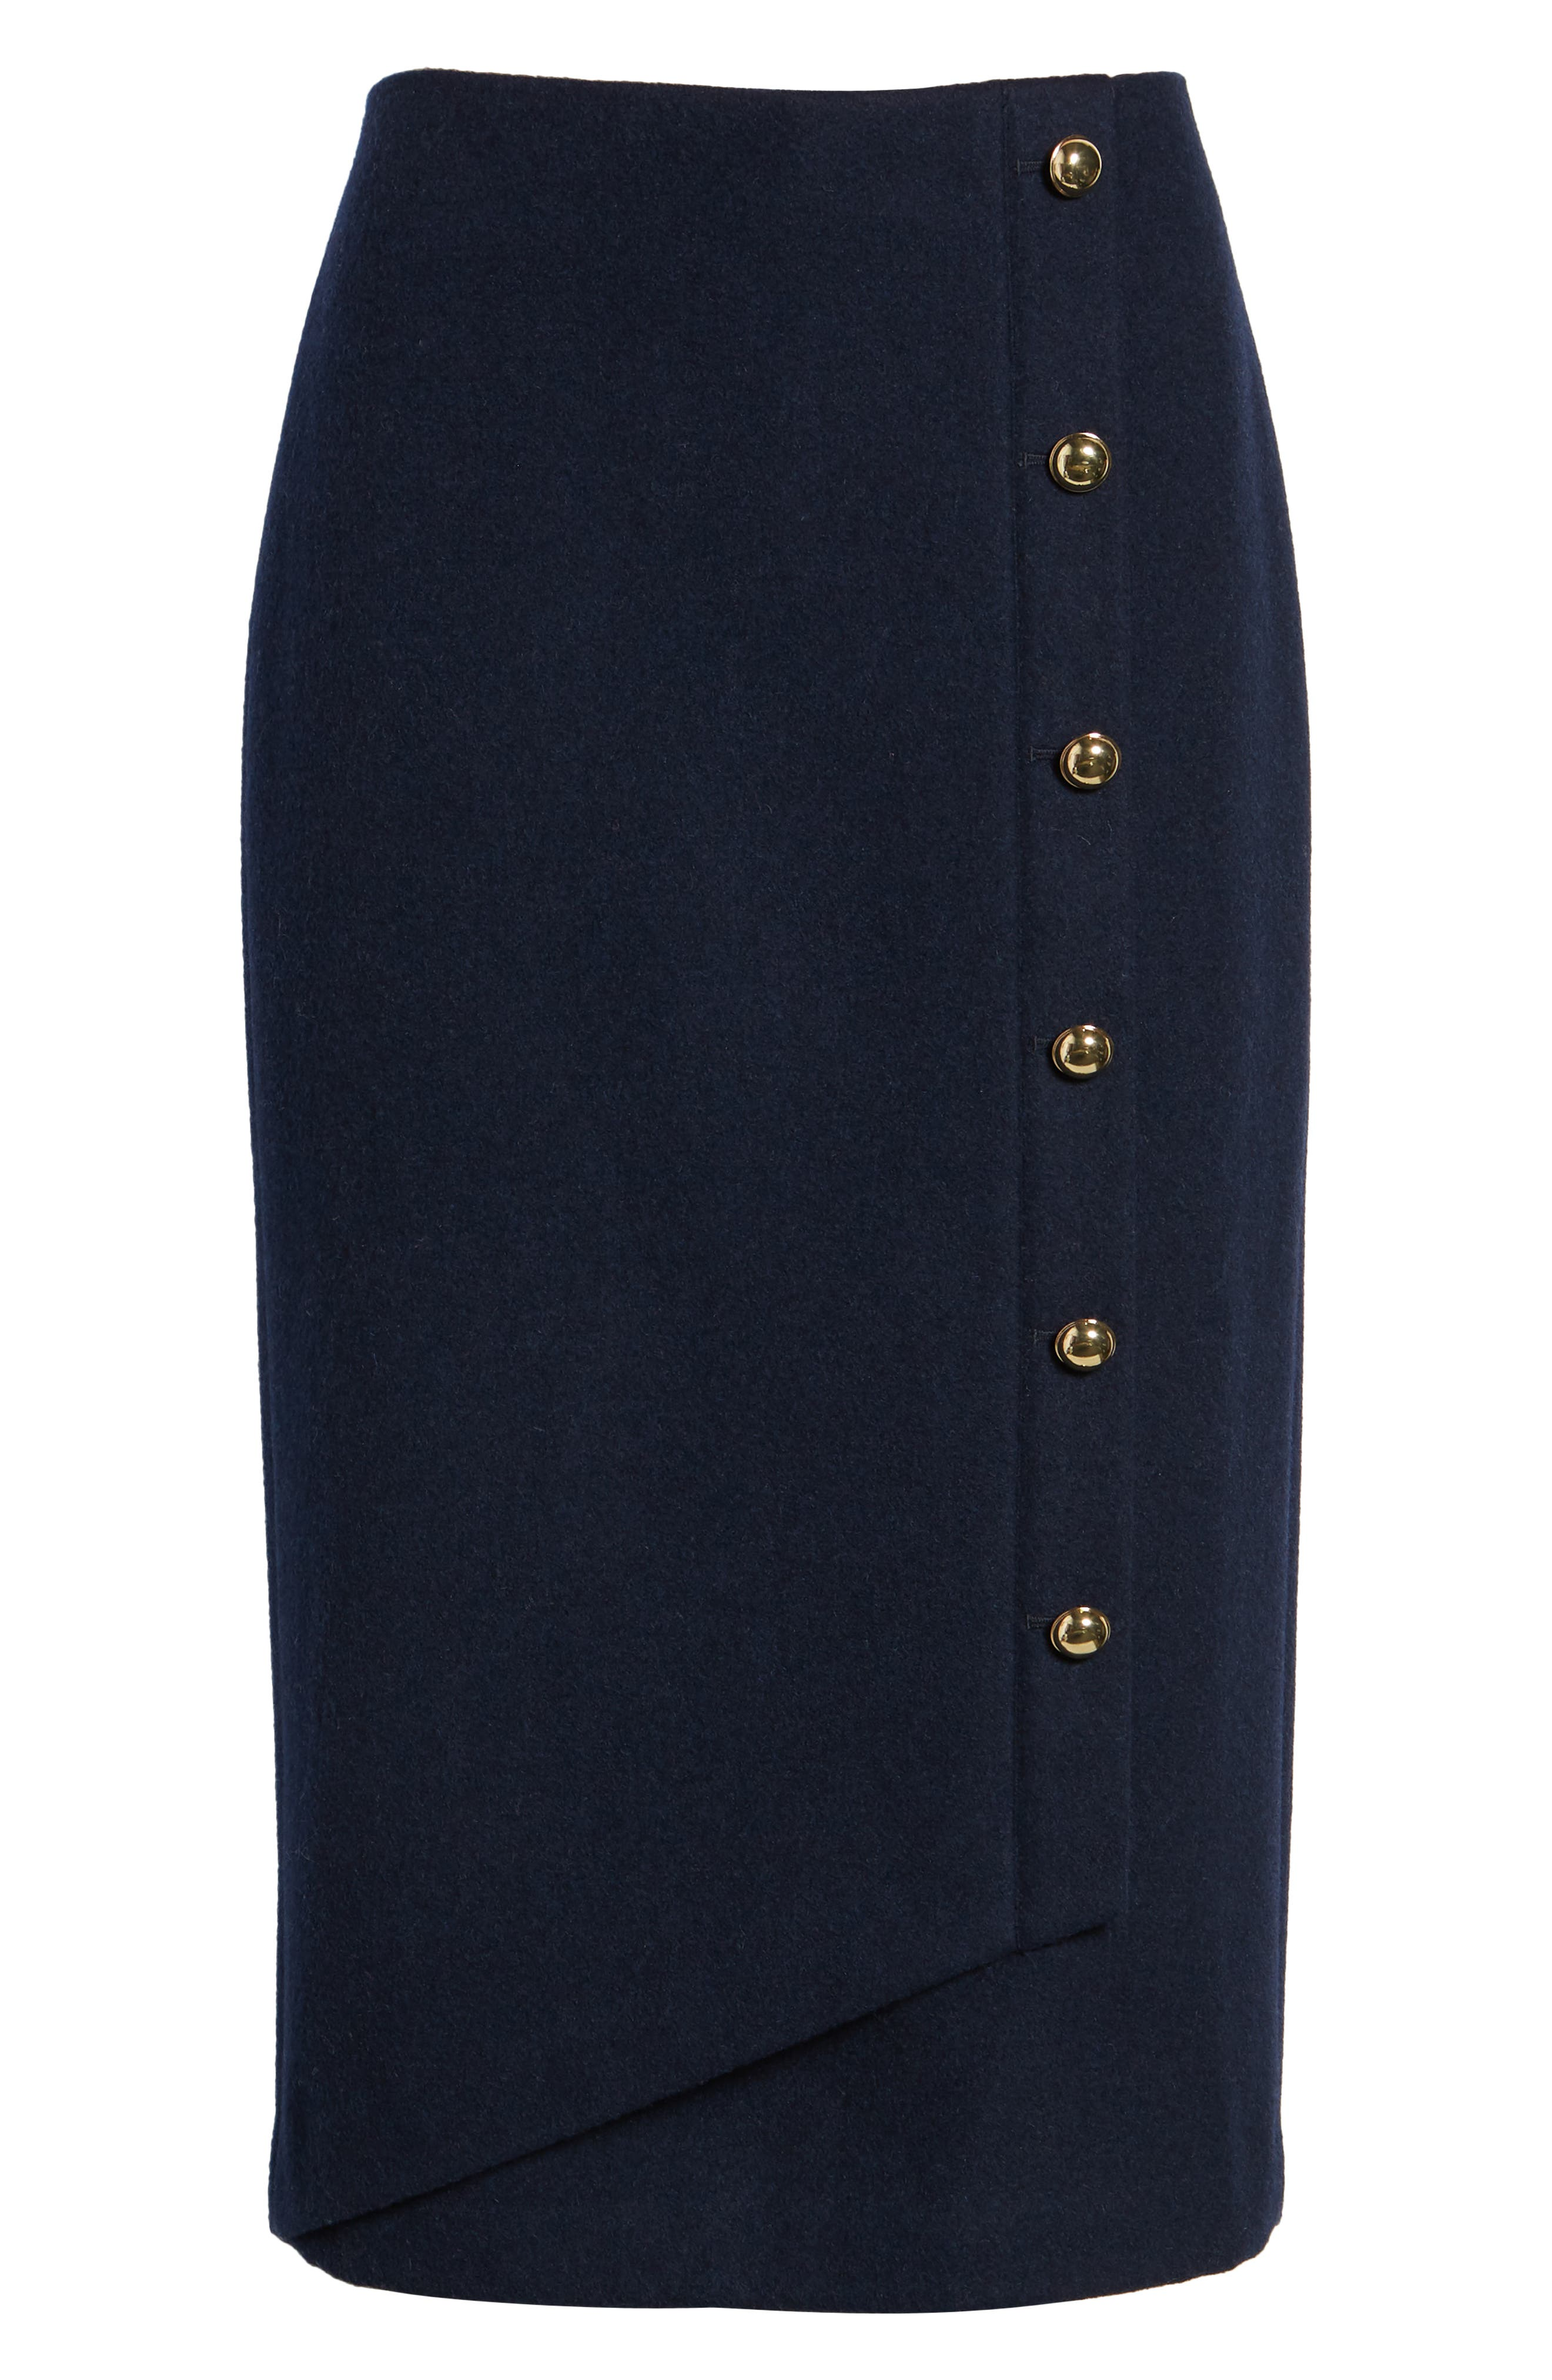 x Atlantic-Pacific Wrap Pencil Skirt,                             Alternate thumbnail 6, color,                             NAVY BLAZER